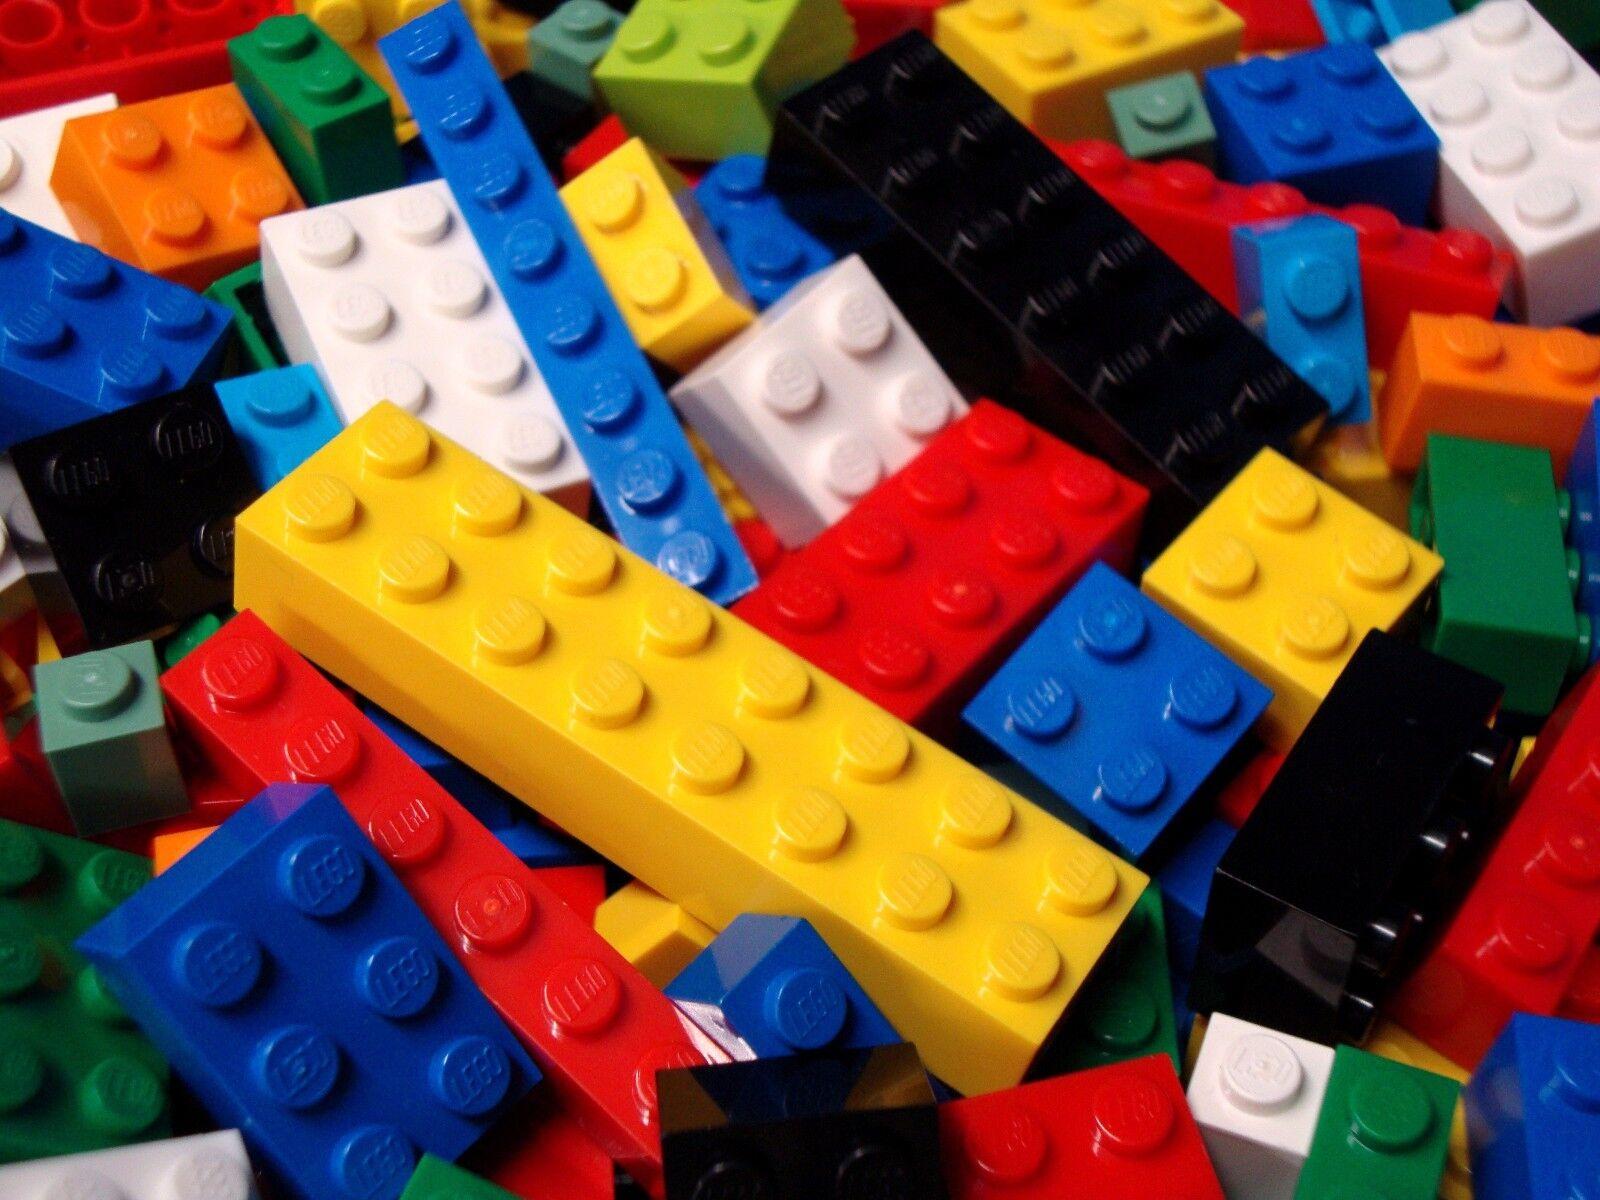 All Lego Bricks Lot 100 Bulk Pieces ONLY BRICKS BLOCKS 1x2 2x2 2x4 2x3...Stud Sz